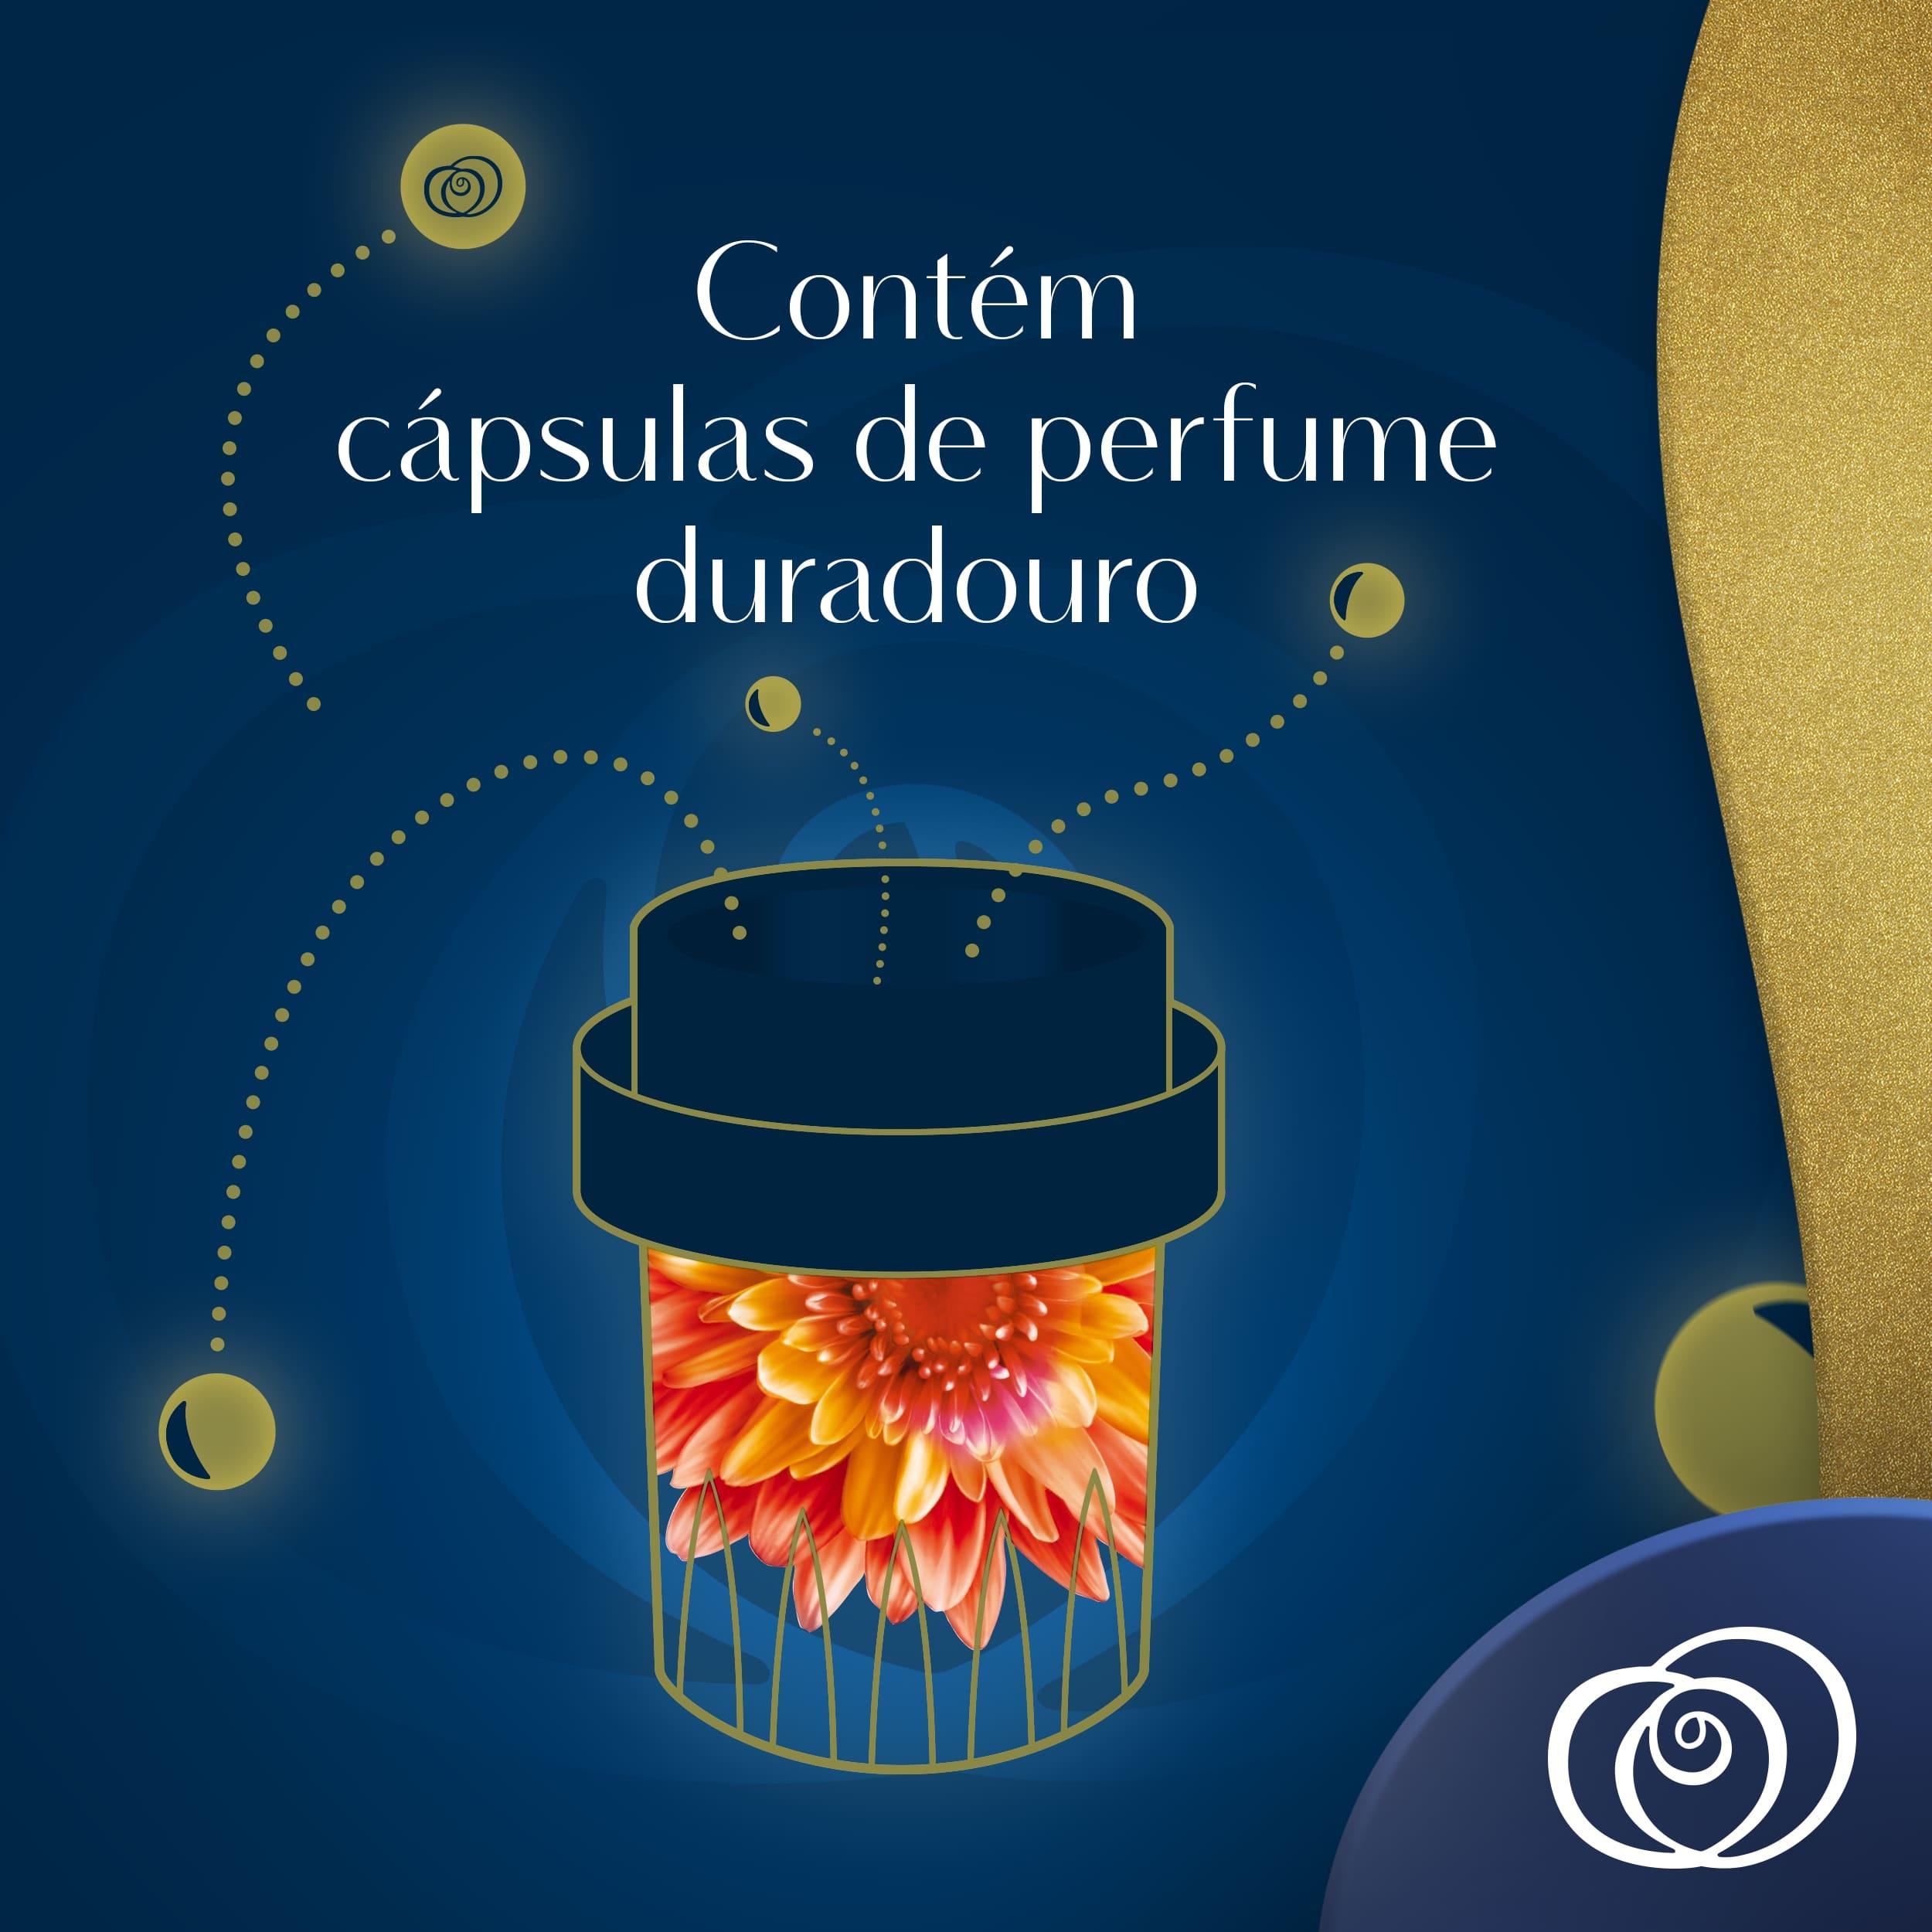 Amaciante Downy Perfume Collection Adorável Secondary 03